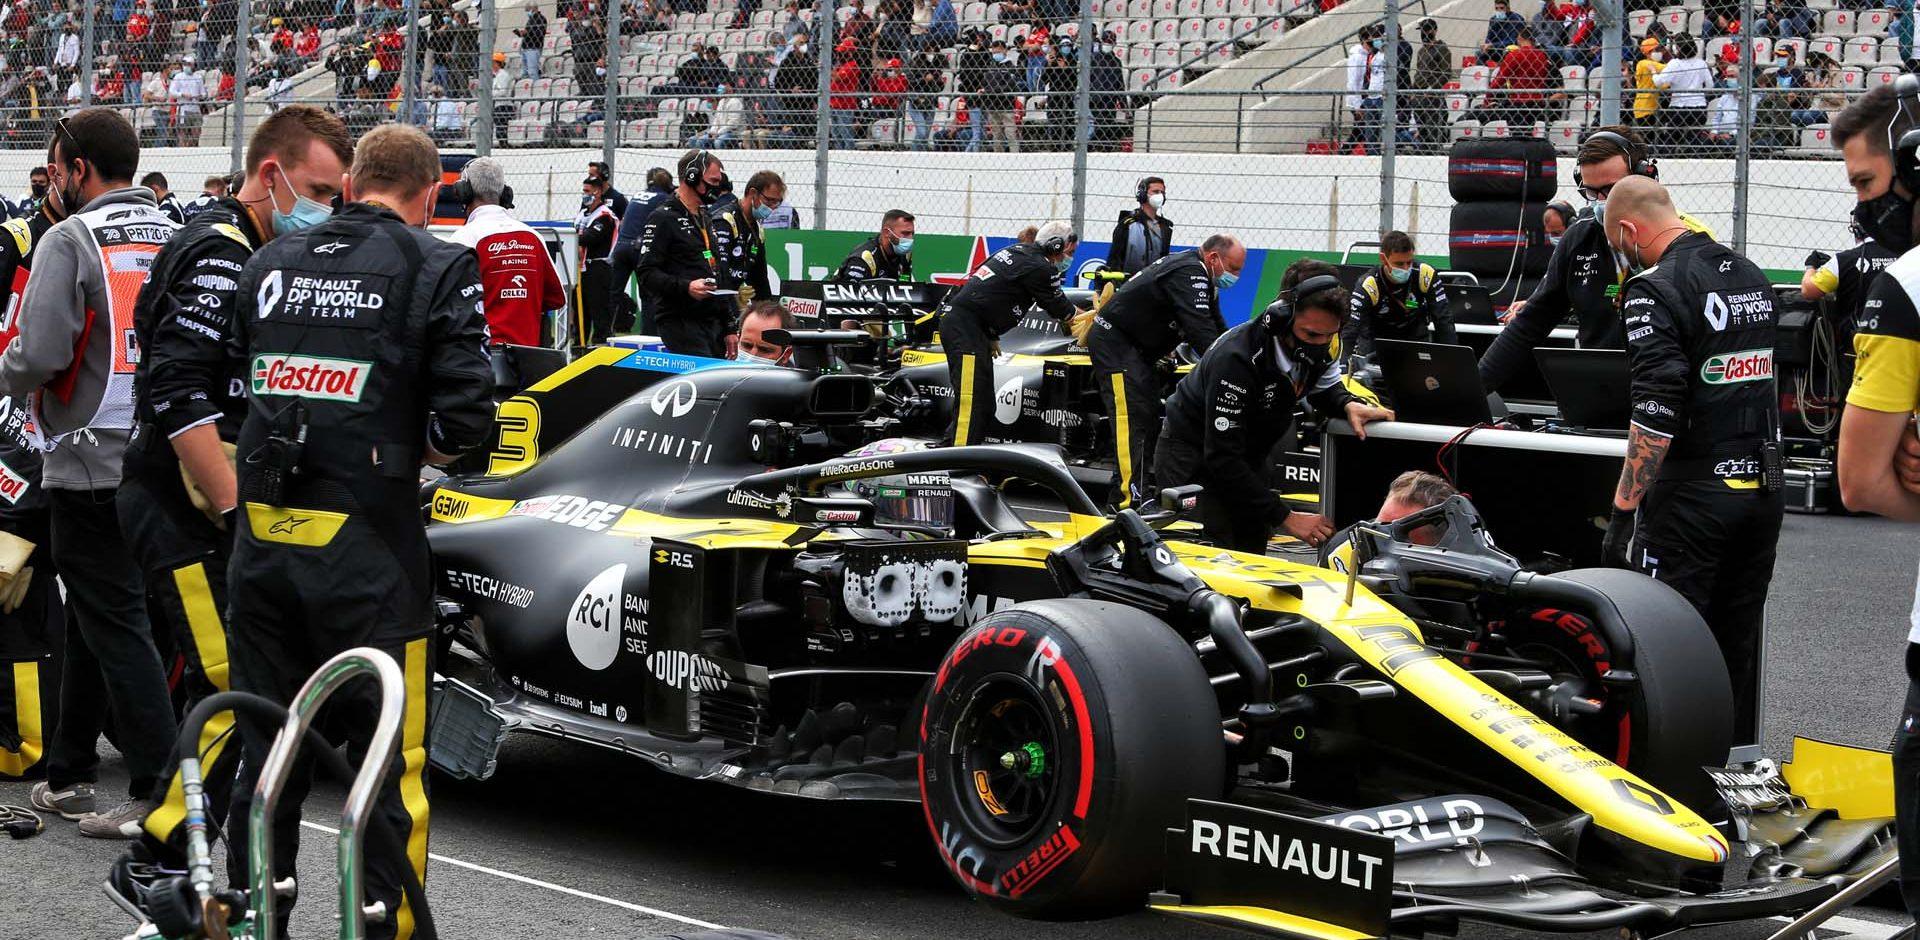 Daniel Ricciardo (AUS) Renault F1 Team RS20 on the grid. Portuguese Grand Prix, Sunday 25th October 2020. Portimao, Portugal.